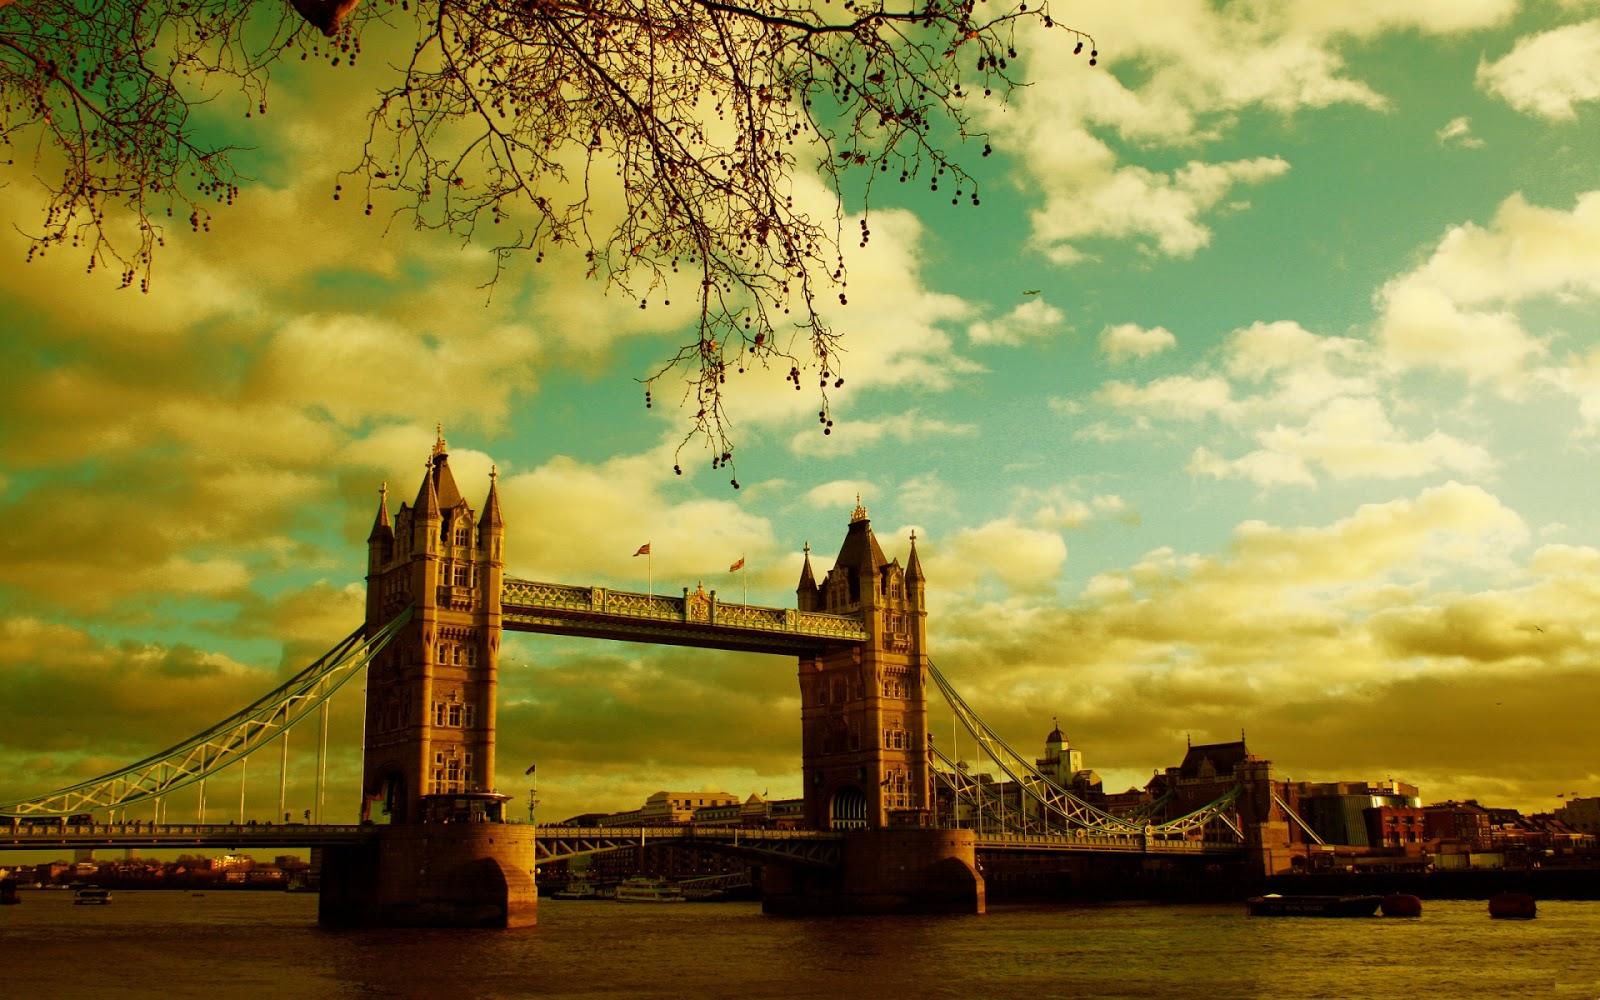 Free Download Wallpaper Hd Tower Bridge Of London Hq